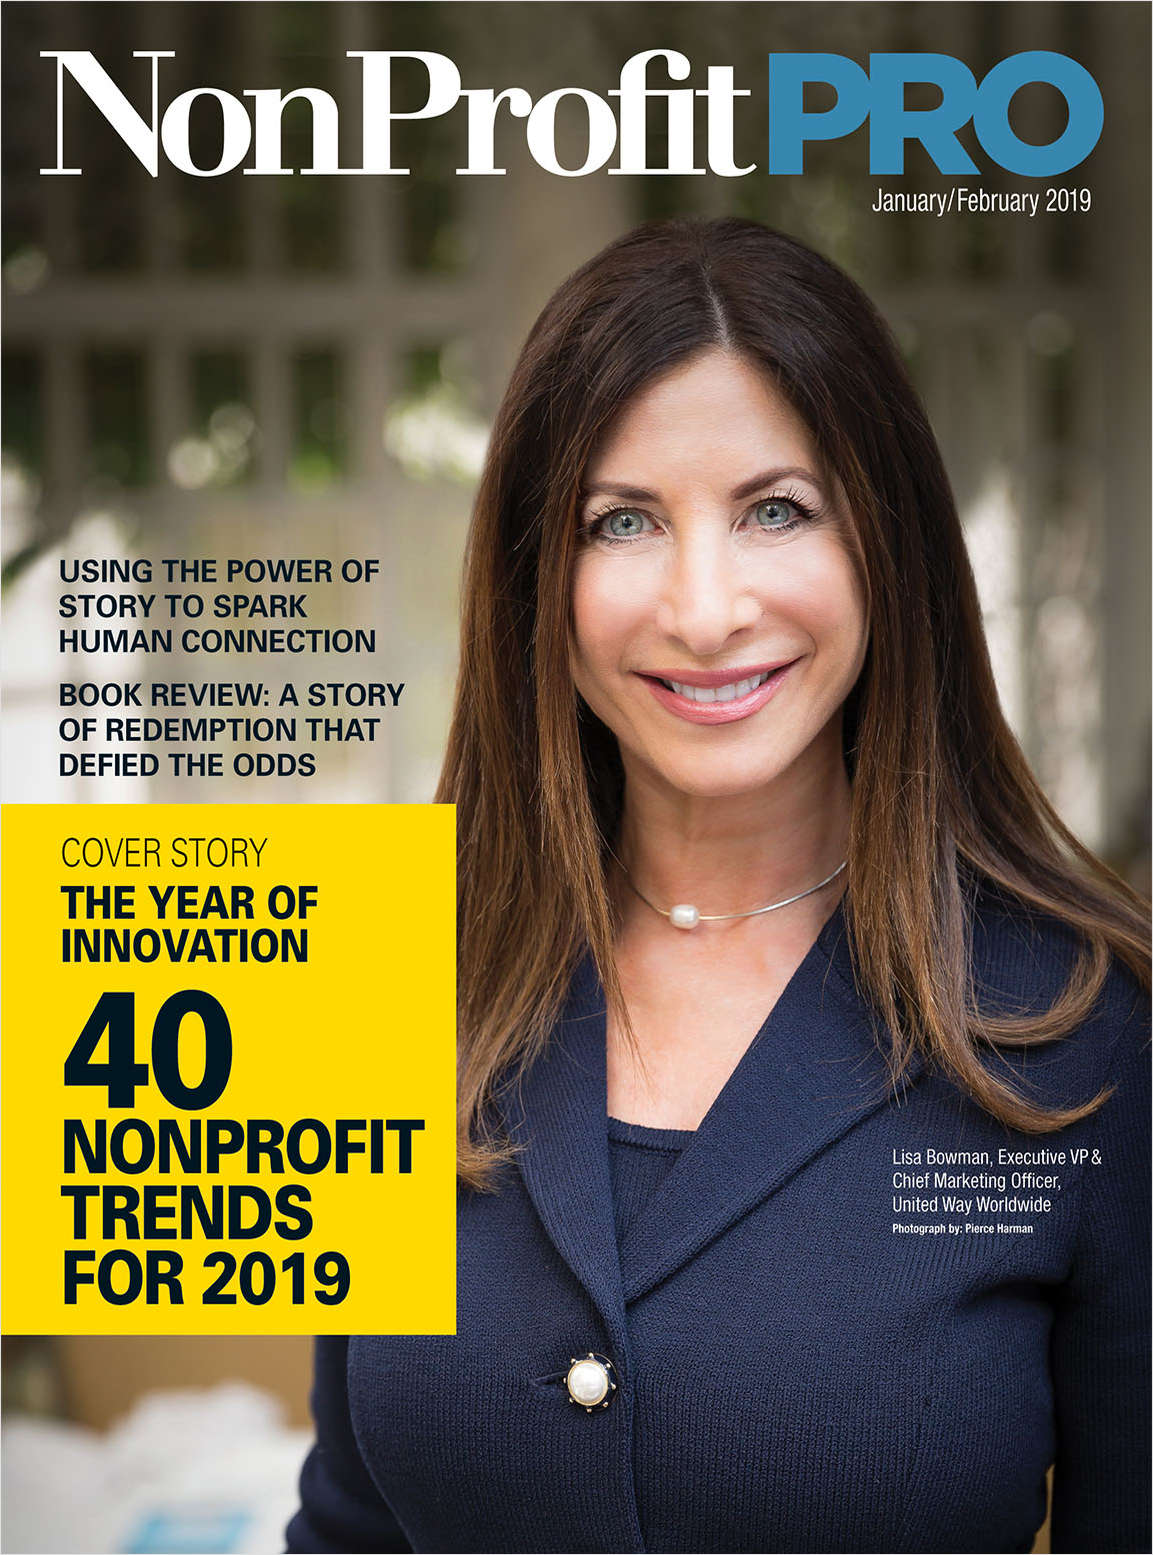 NonProfit Pro